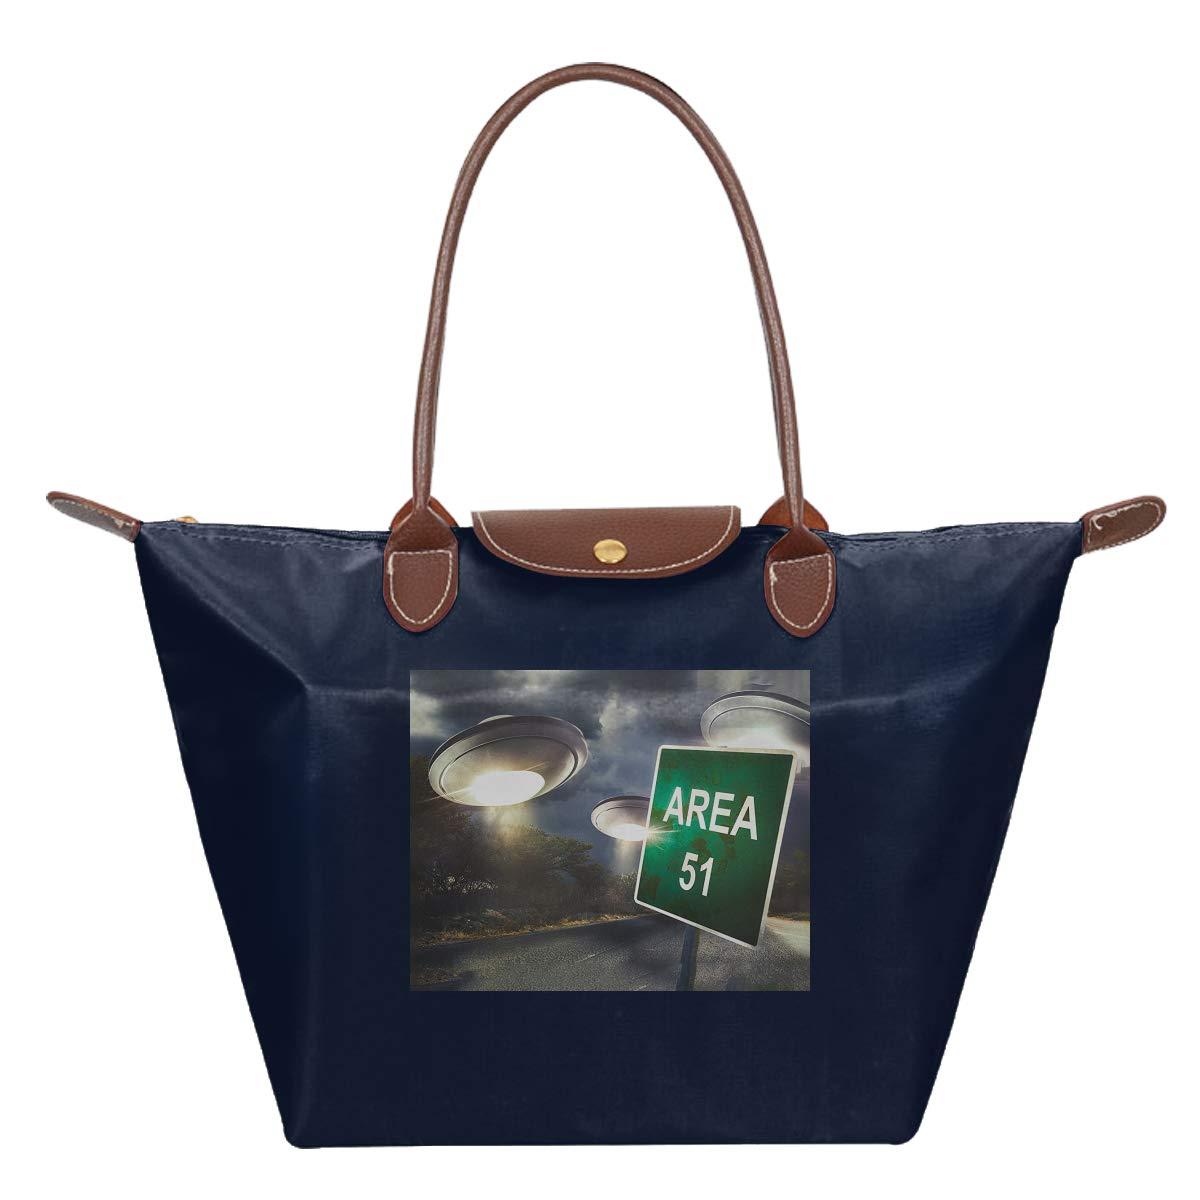 Area 51 UFO Aliens Spaceship Space Waterproof Leather Folded Messenger Nylon Bag Travel Tote Hopping Folding School Handbags